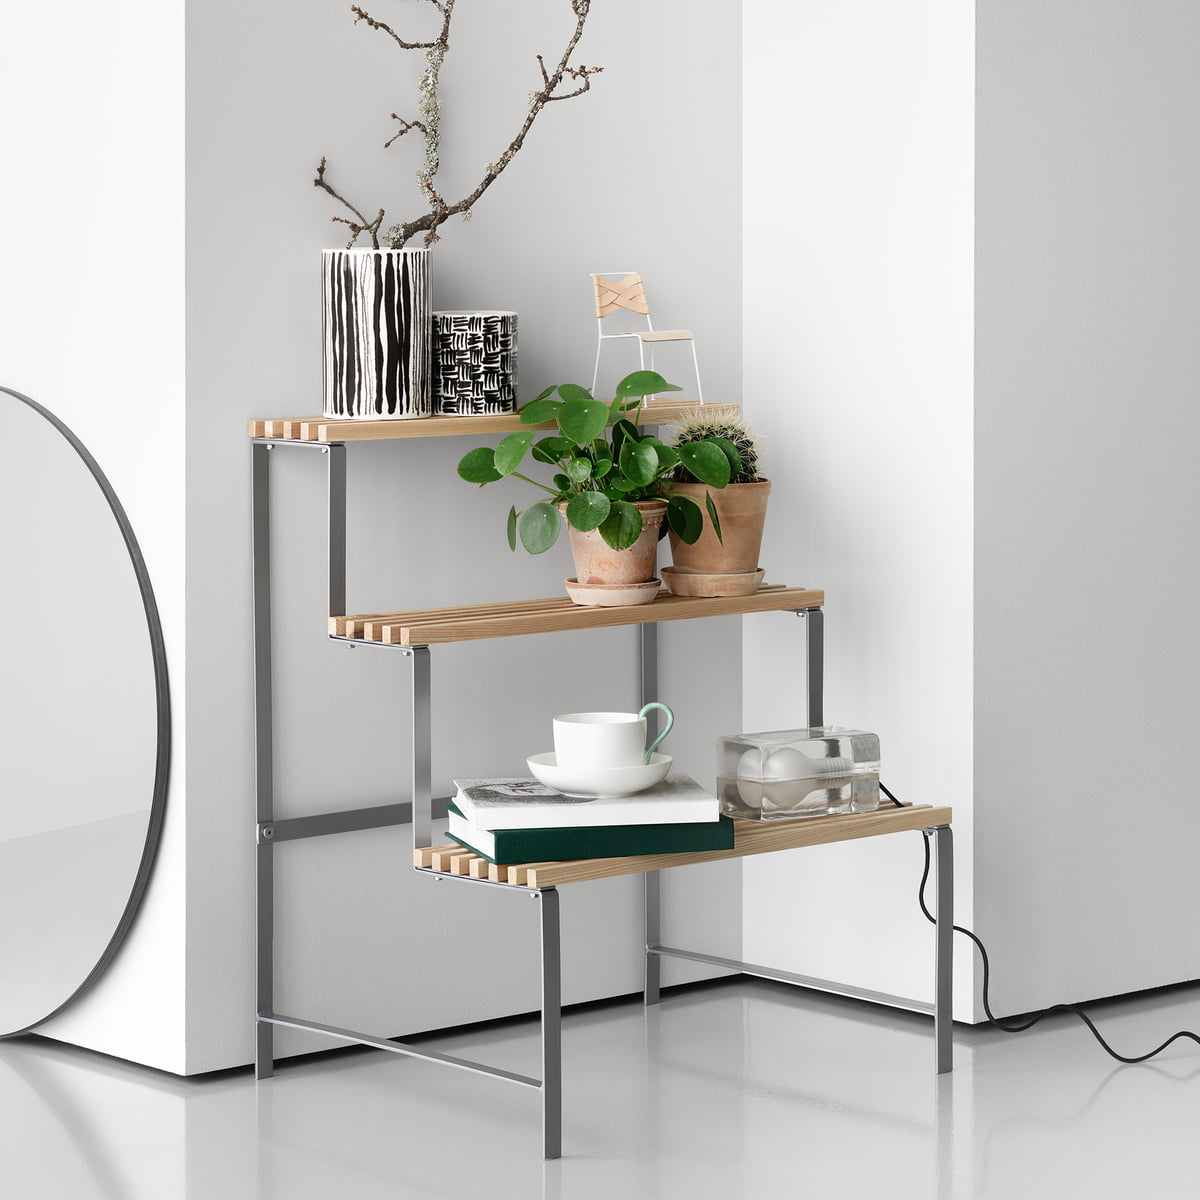 Flower pot stand by design house stockholm for Design de stand